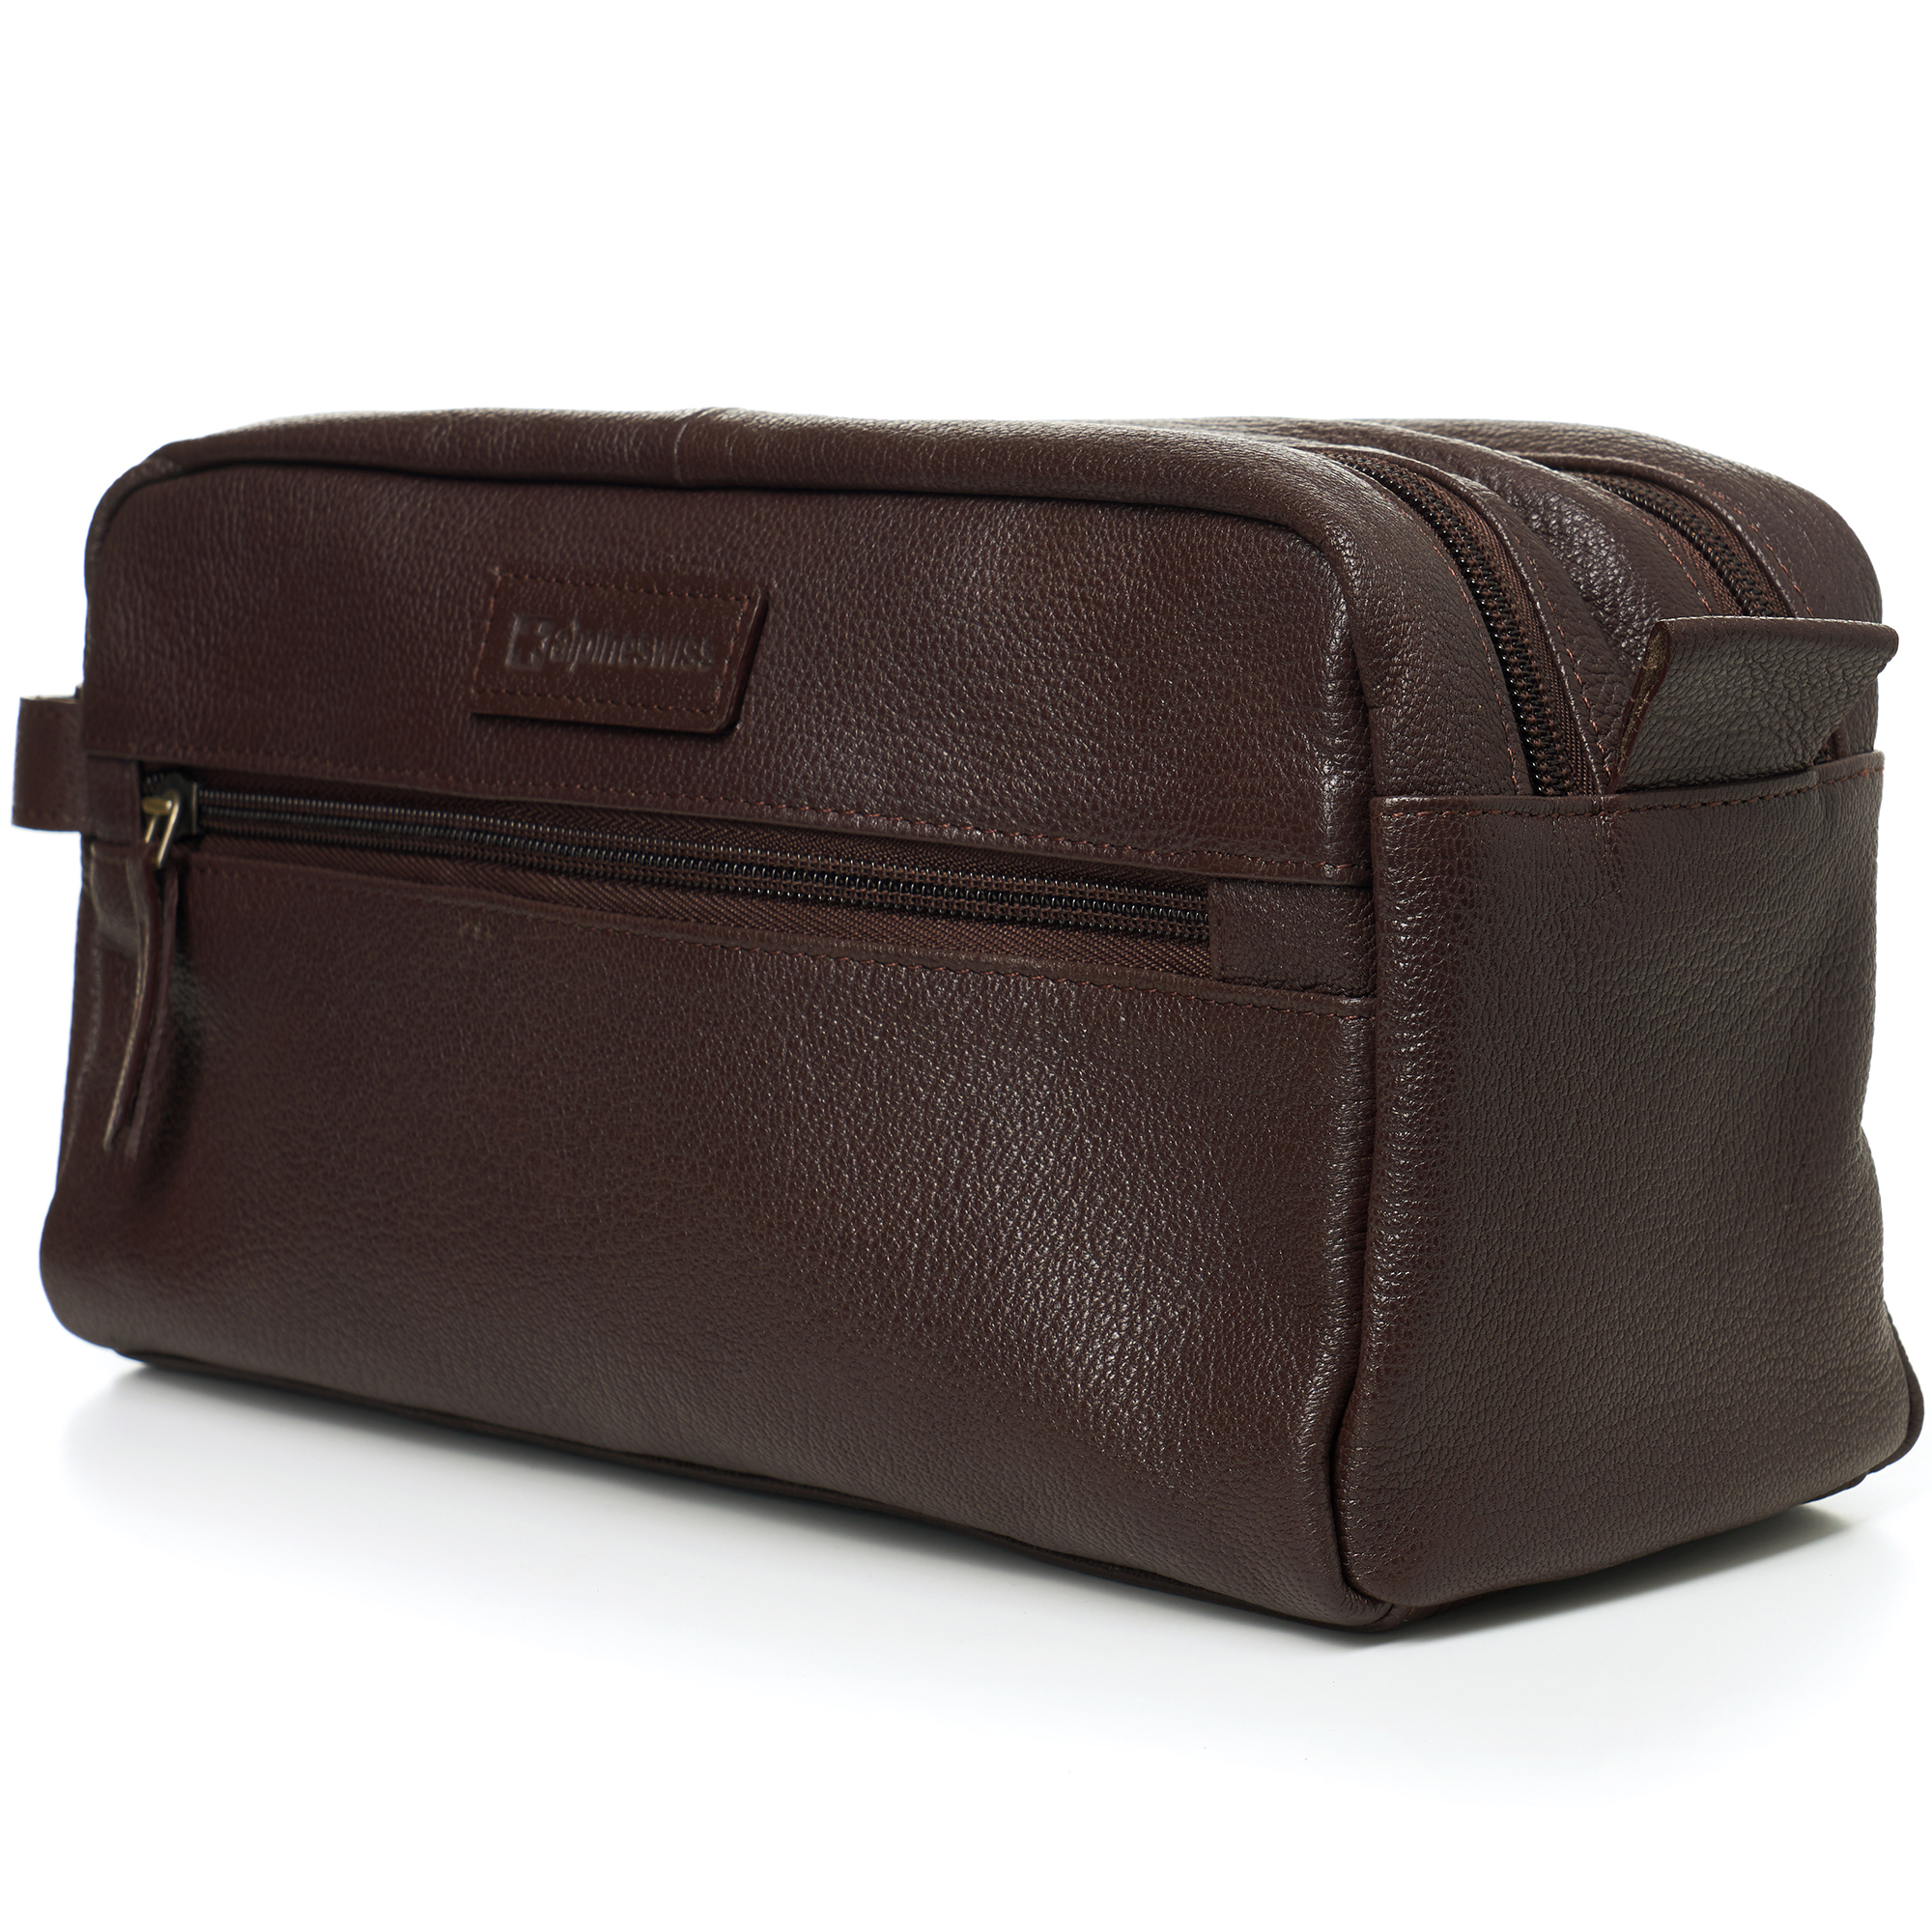 AlpineSwiss-Sedona-Toiletry-Bag-Genuine-Leather-Shaving-Kit-Dopp-Kit-Travel-Case thumbnail 22